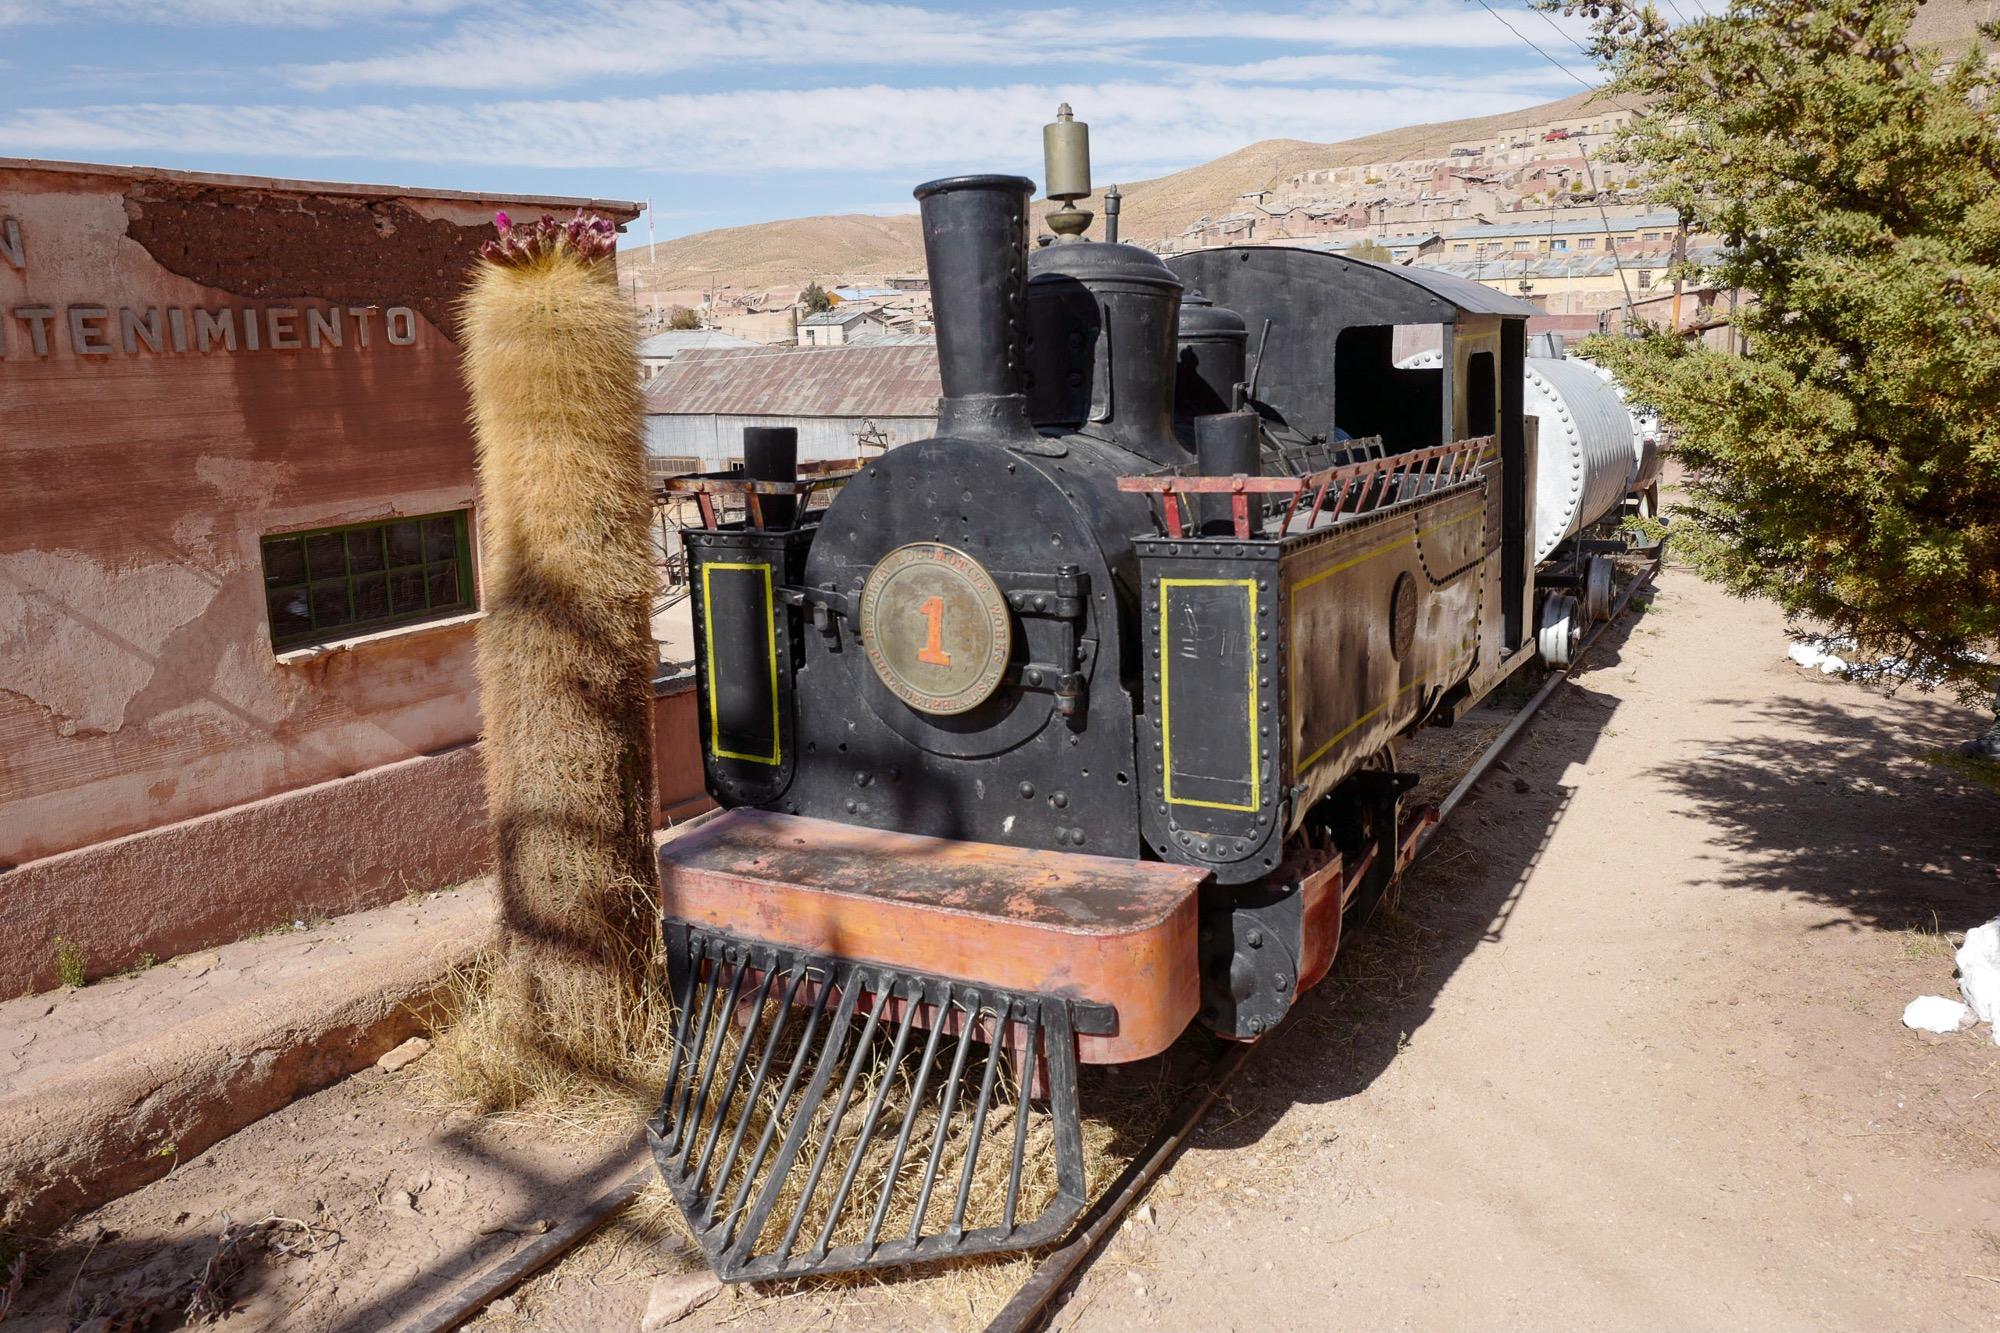 Oldest Steam Locomotive is found in Pulacayo, Bolivia